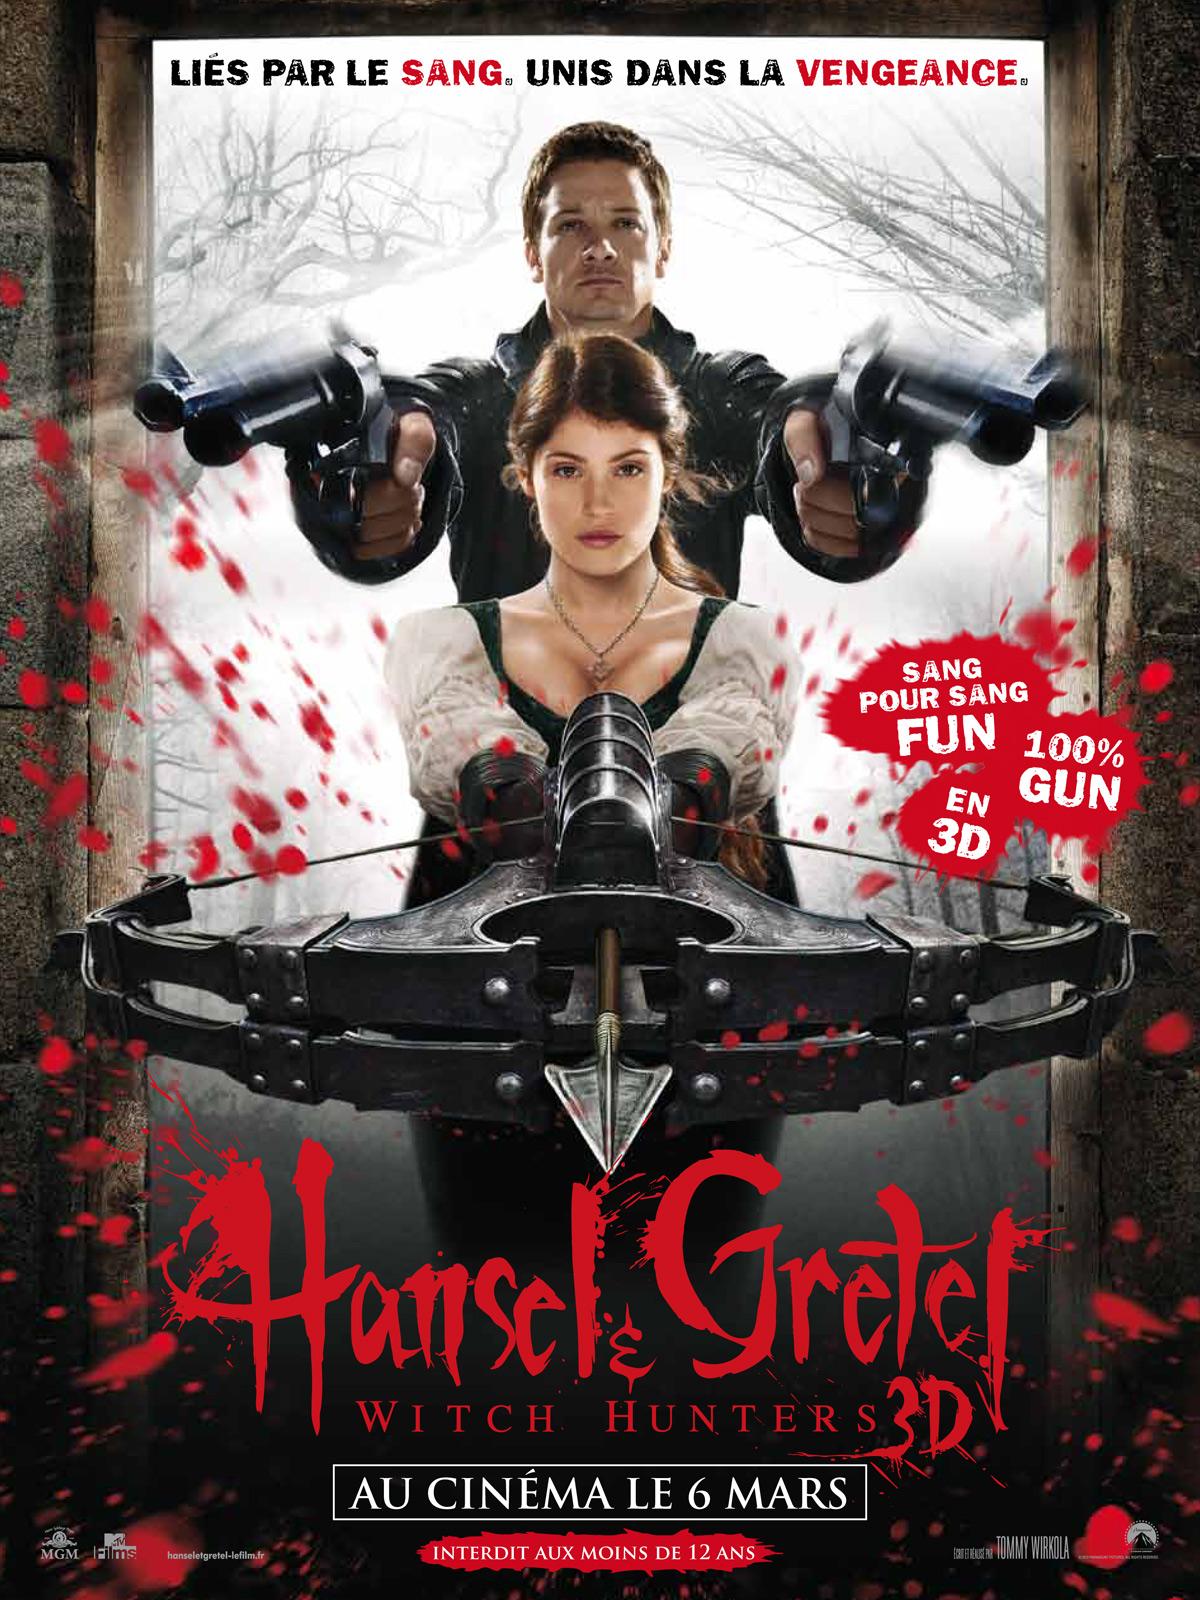 Hansel & Gretel : Witch Hunters ddl